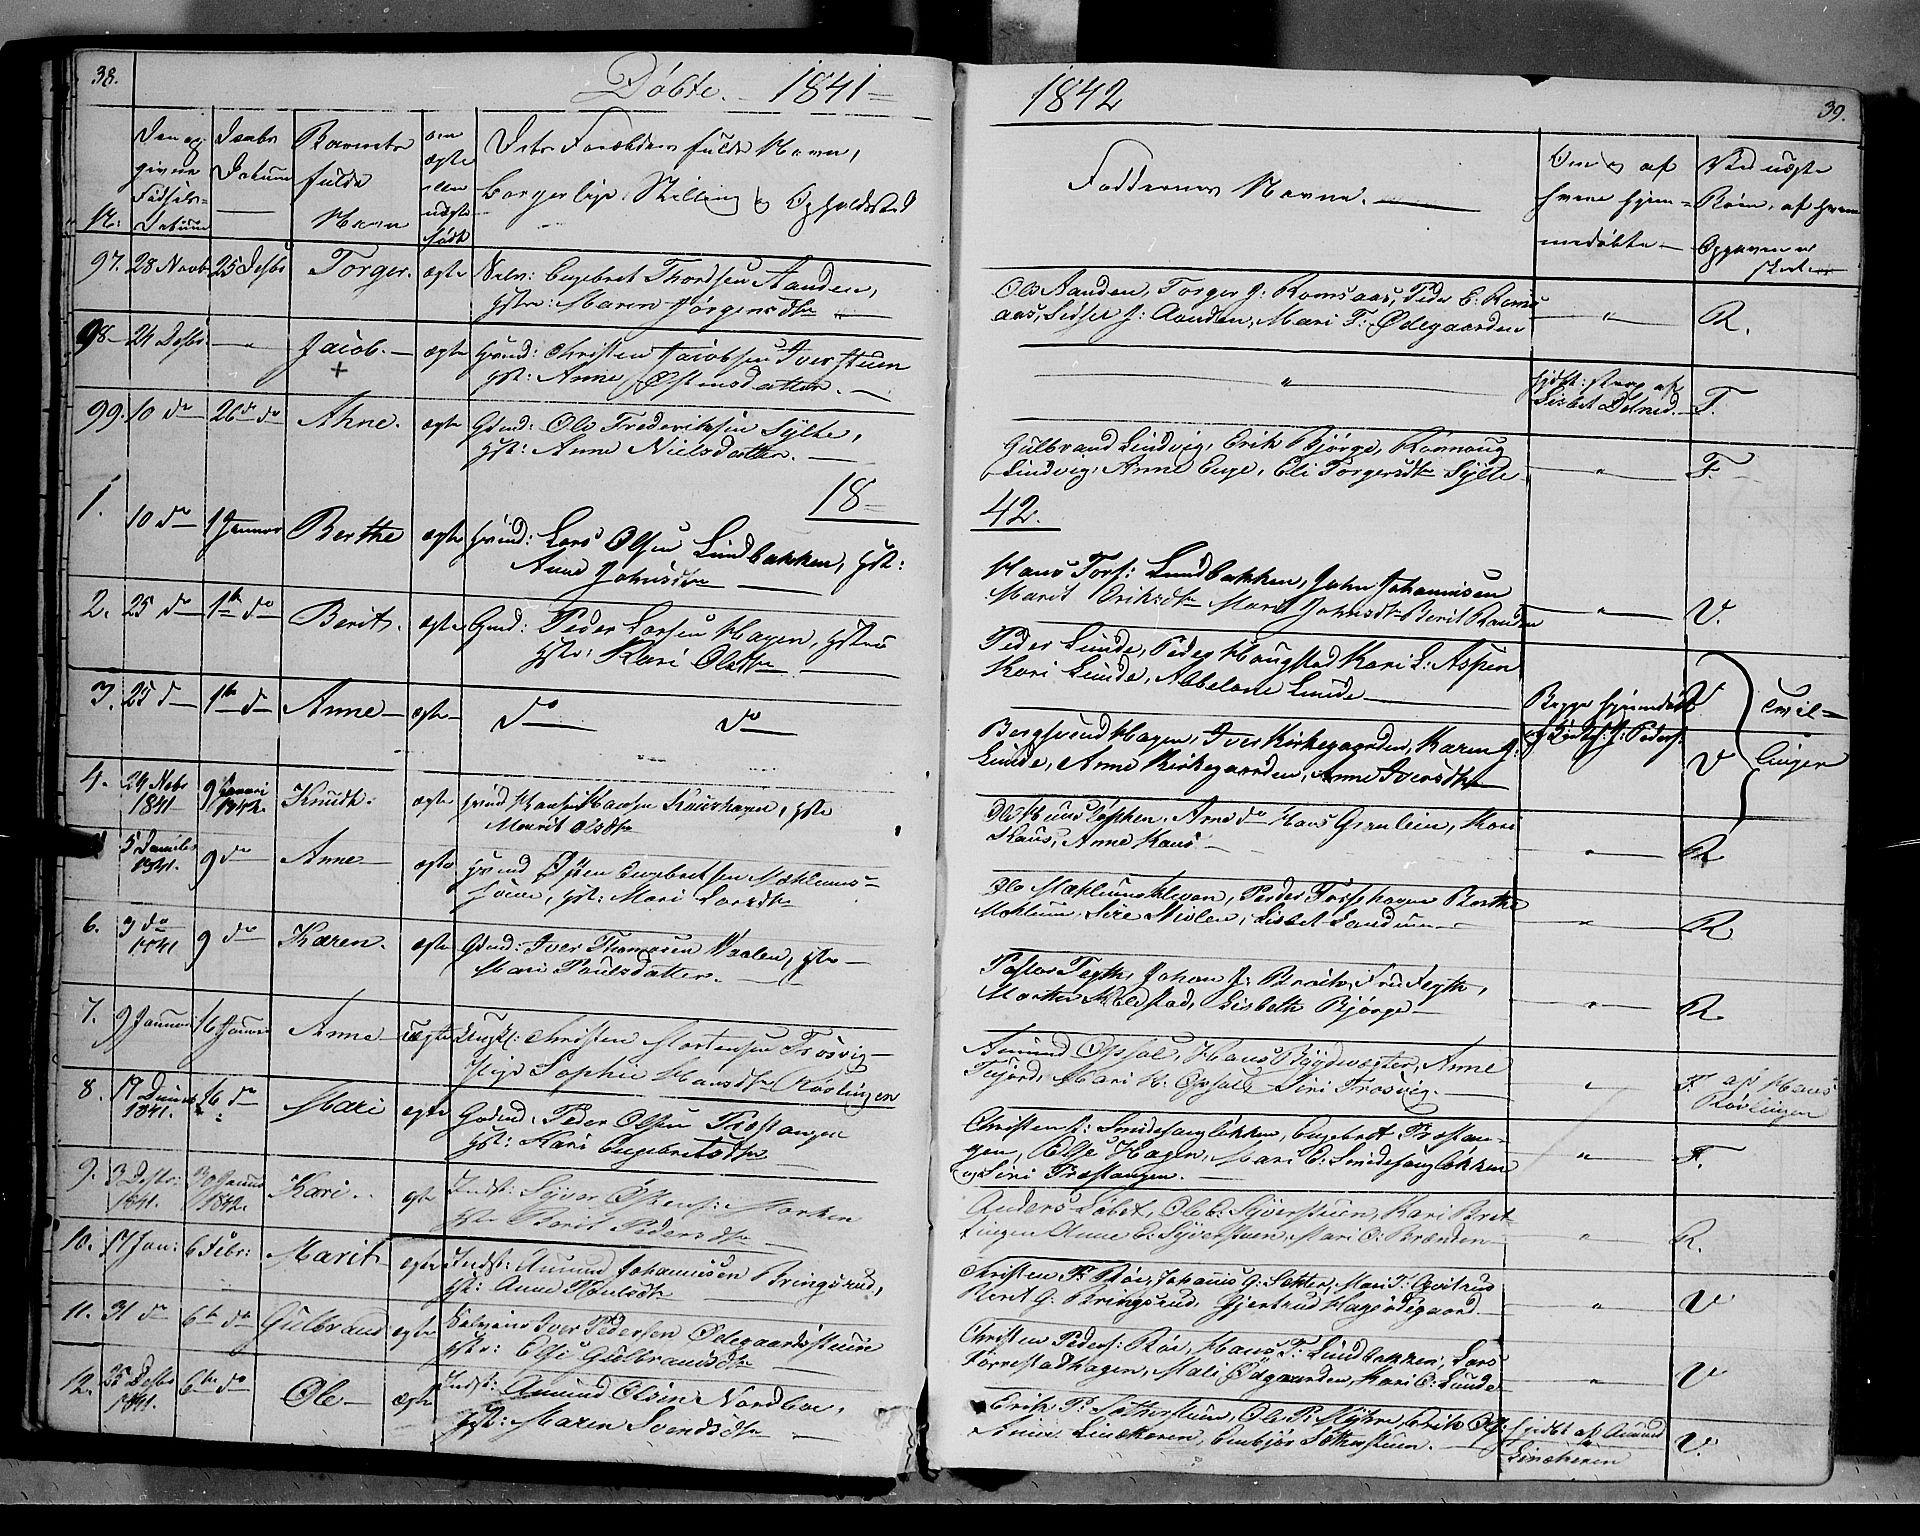 SAH, Ringebu prestekontor, Ministerialbok nr. 5, 1839-1848, s. 38-39